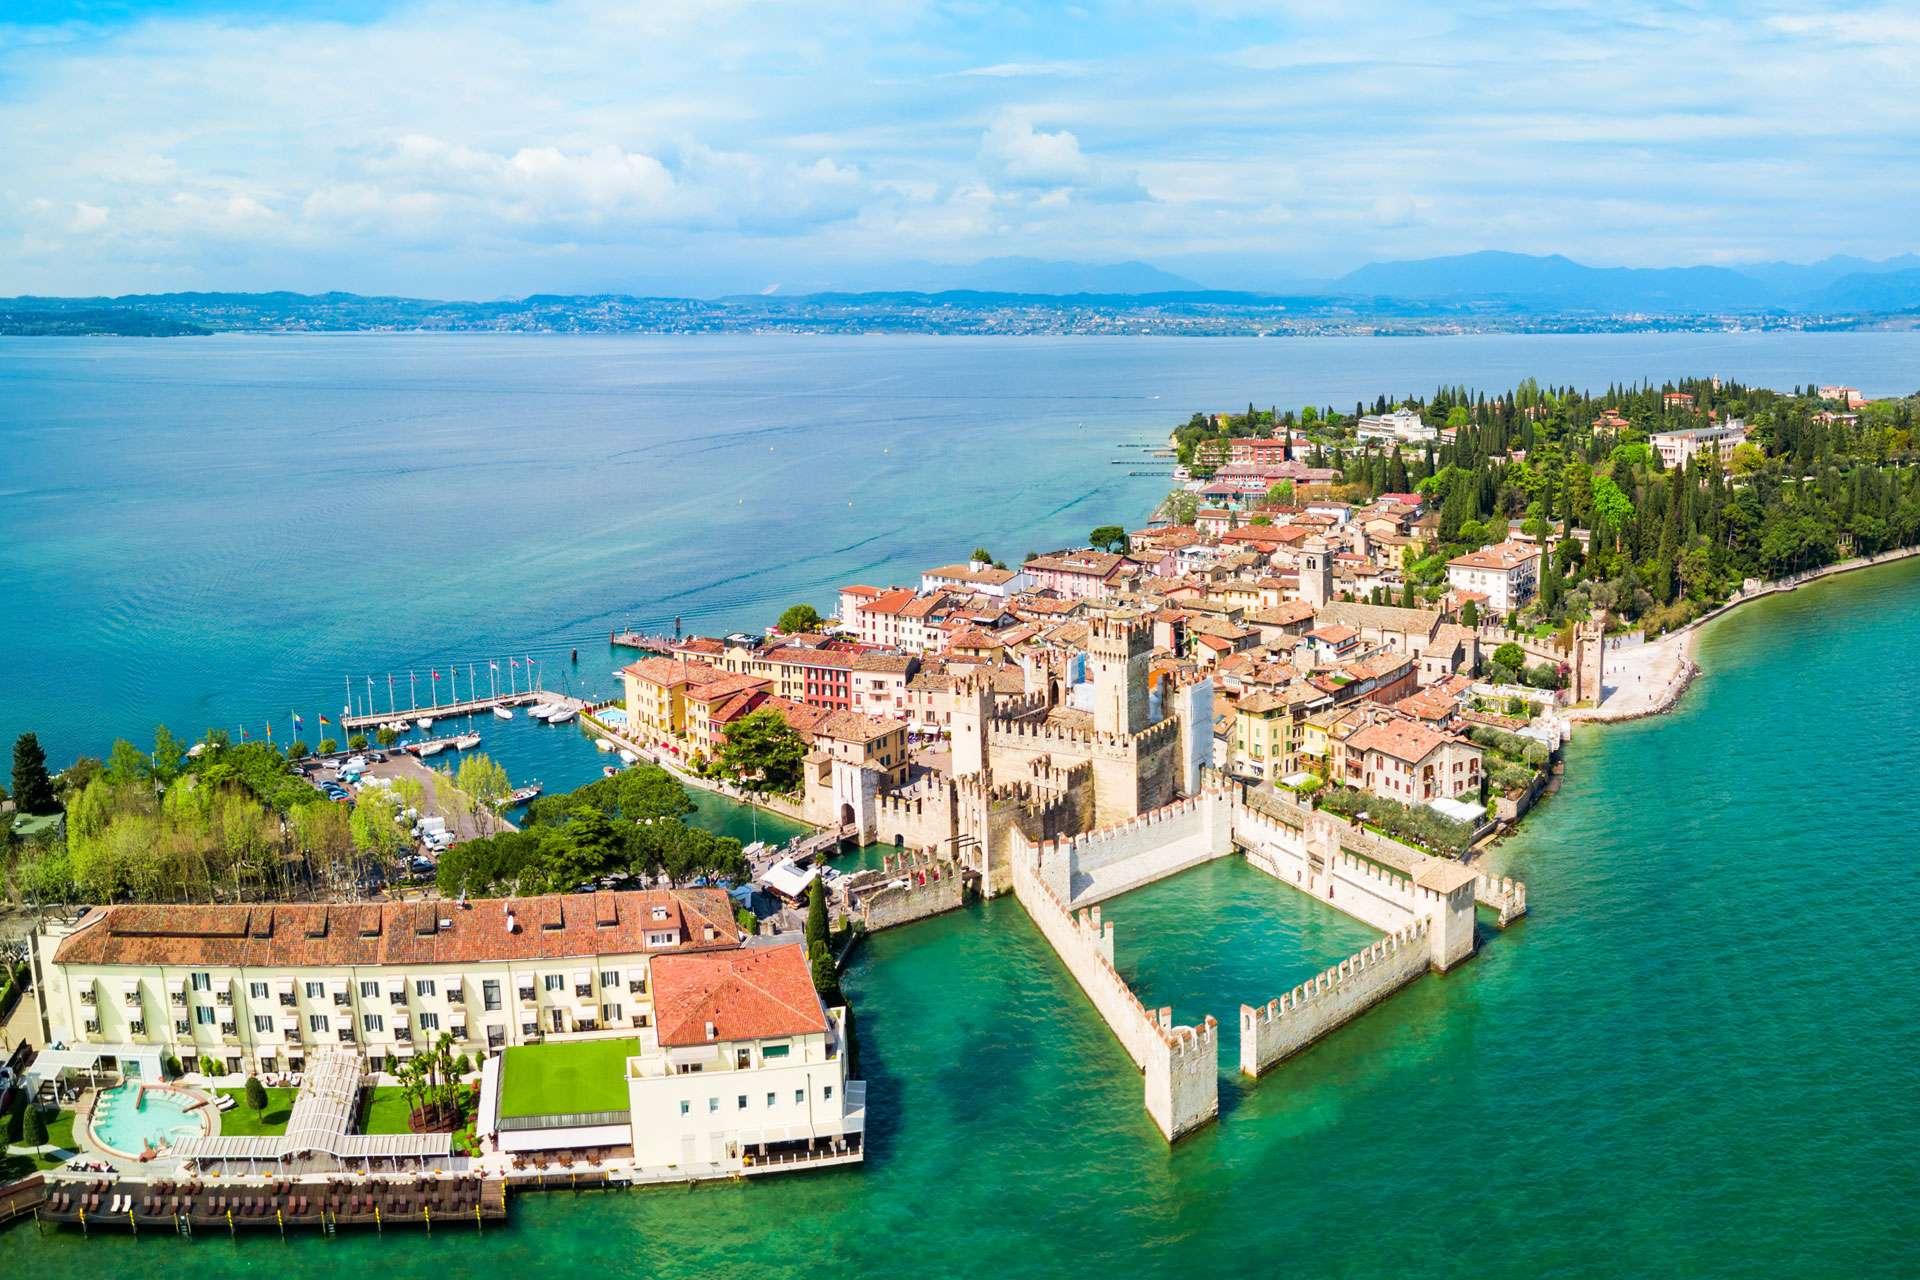 Best Lakeside Towns to Visit around Garda